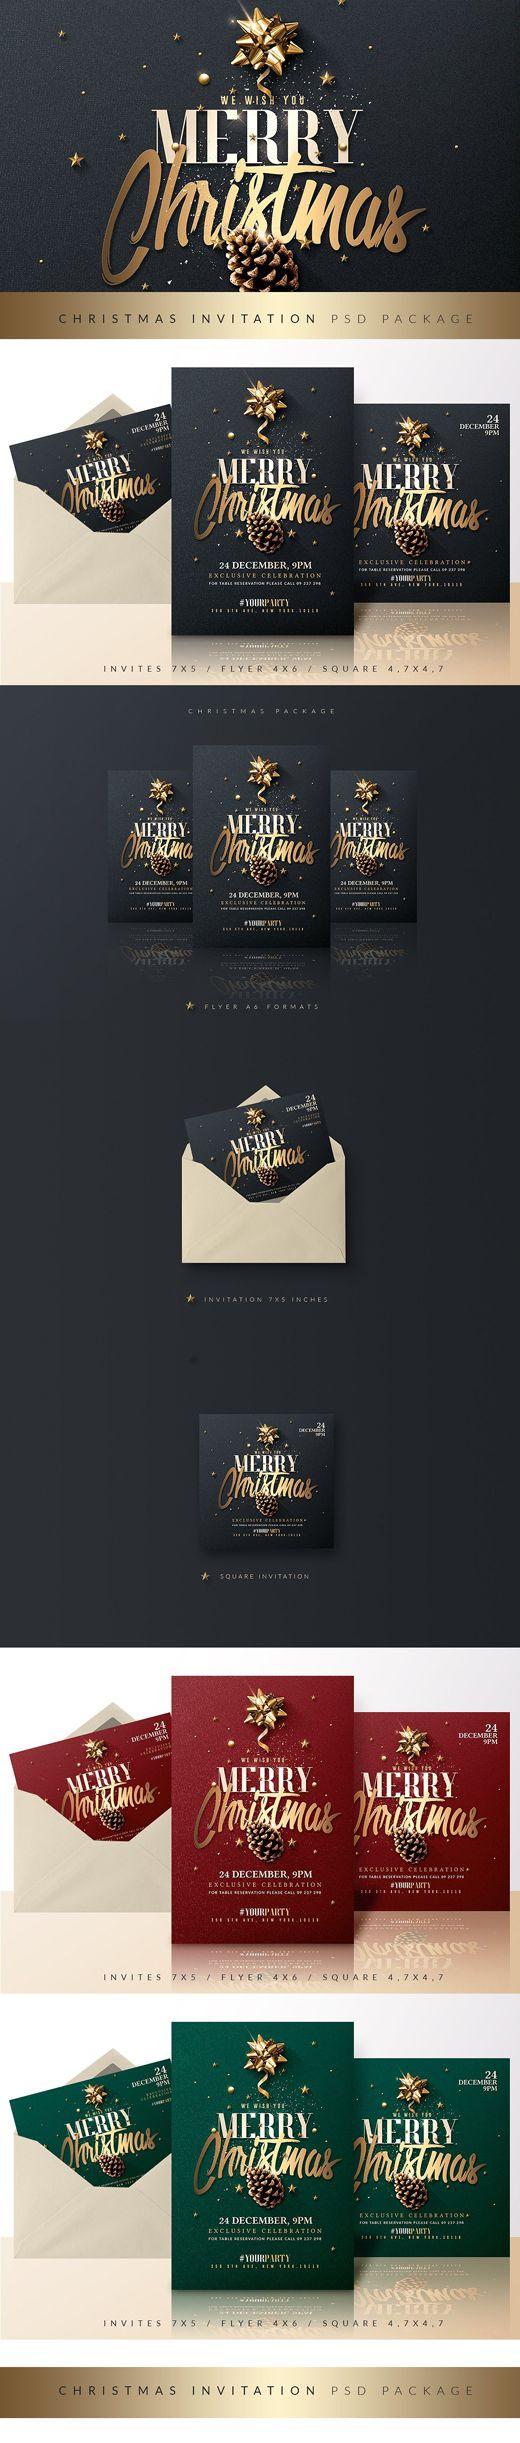 Christmas Invitation Psd Package v3 - #classy #christmas #bundle #invitation #art #style #graphics #creative #flyer #shopping #typography #creativemarket